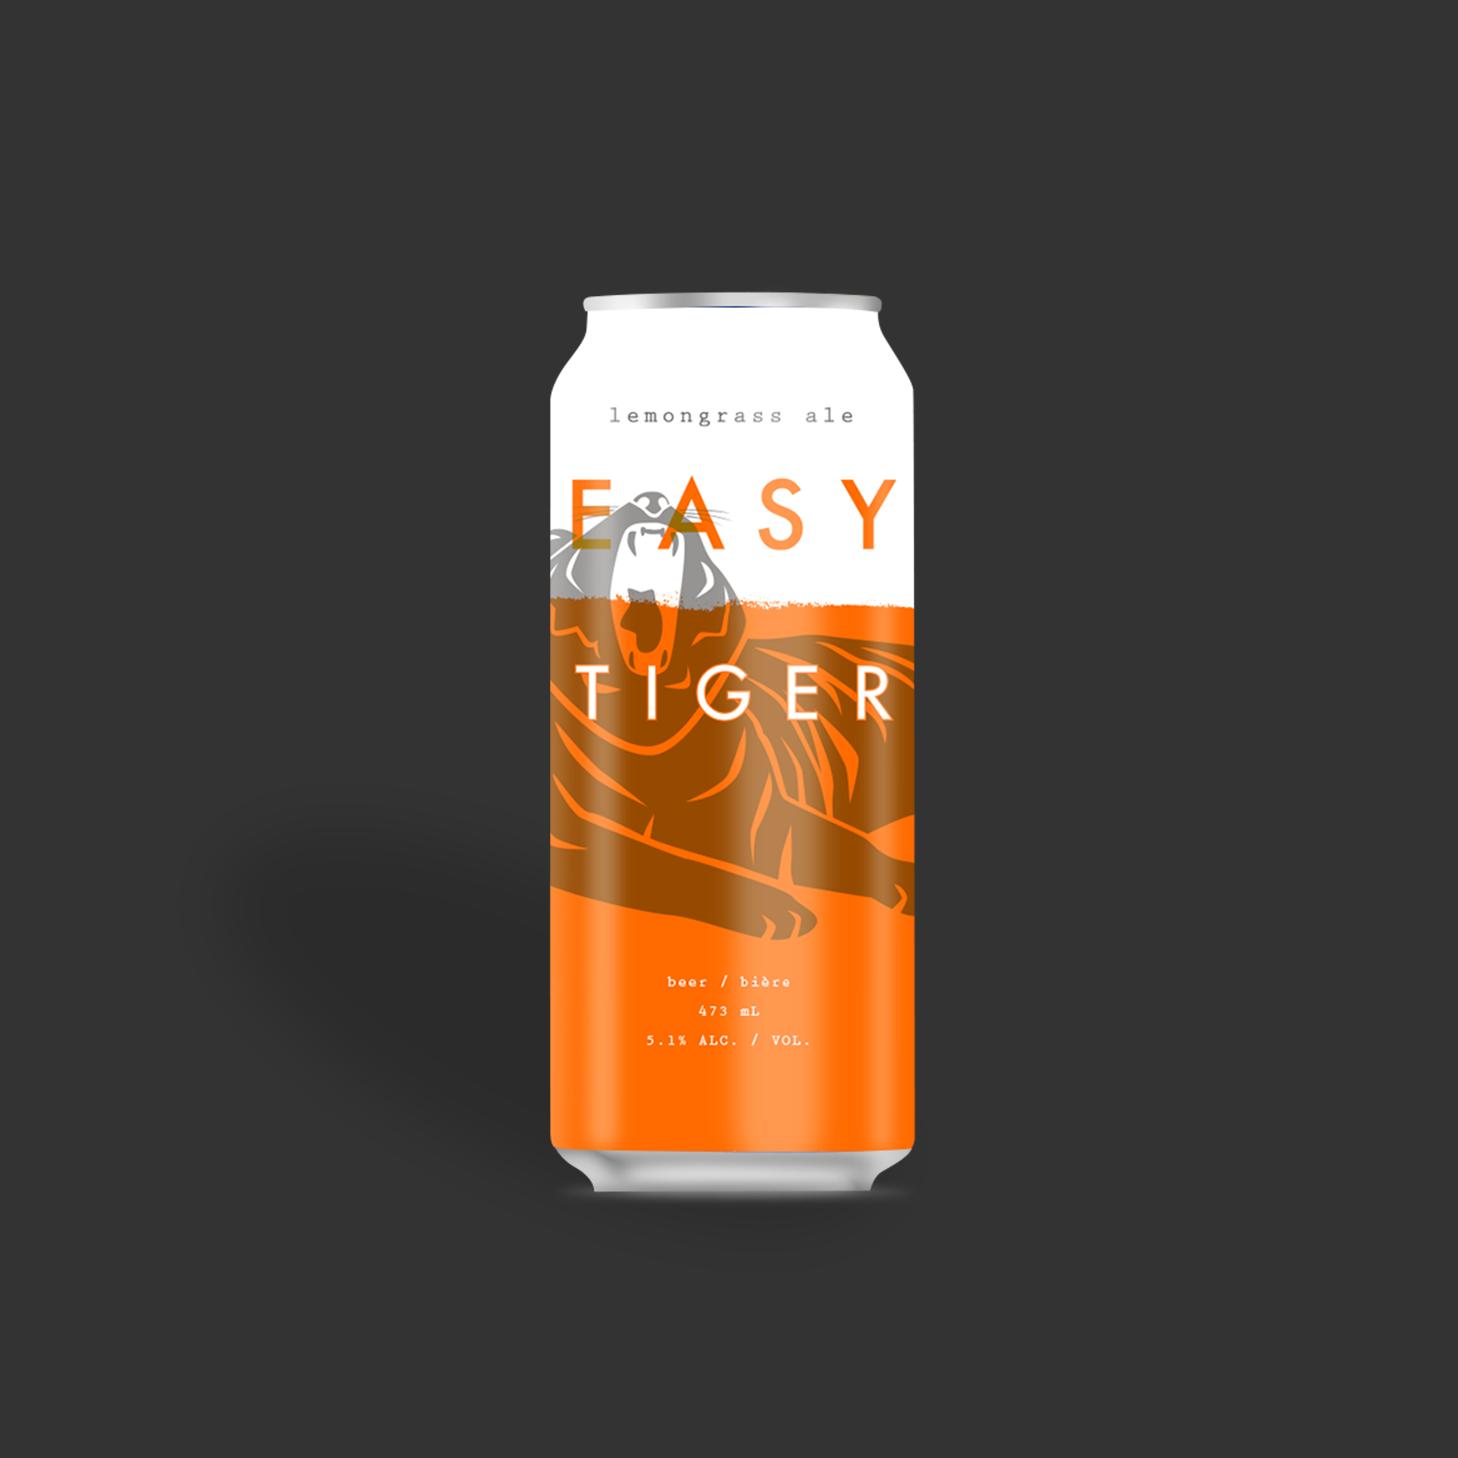 Easy Tiger Lemongrass Ale